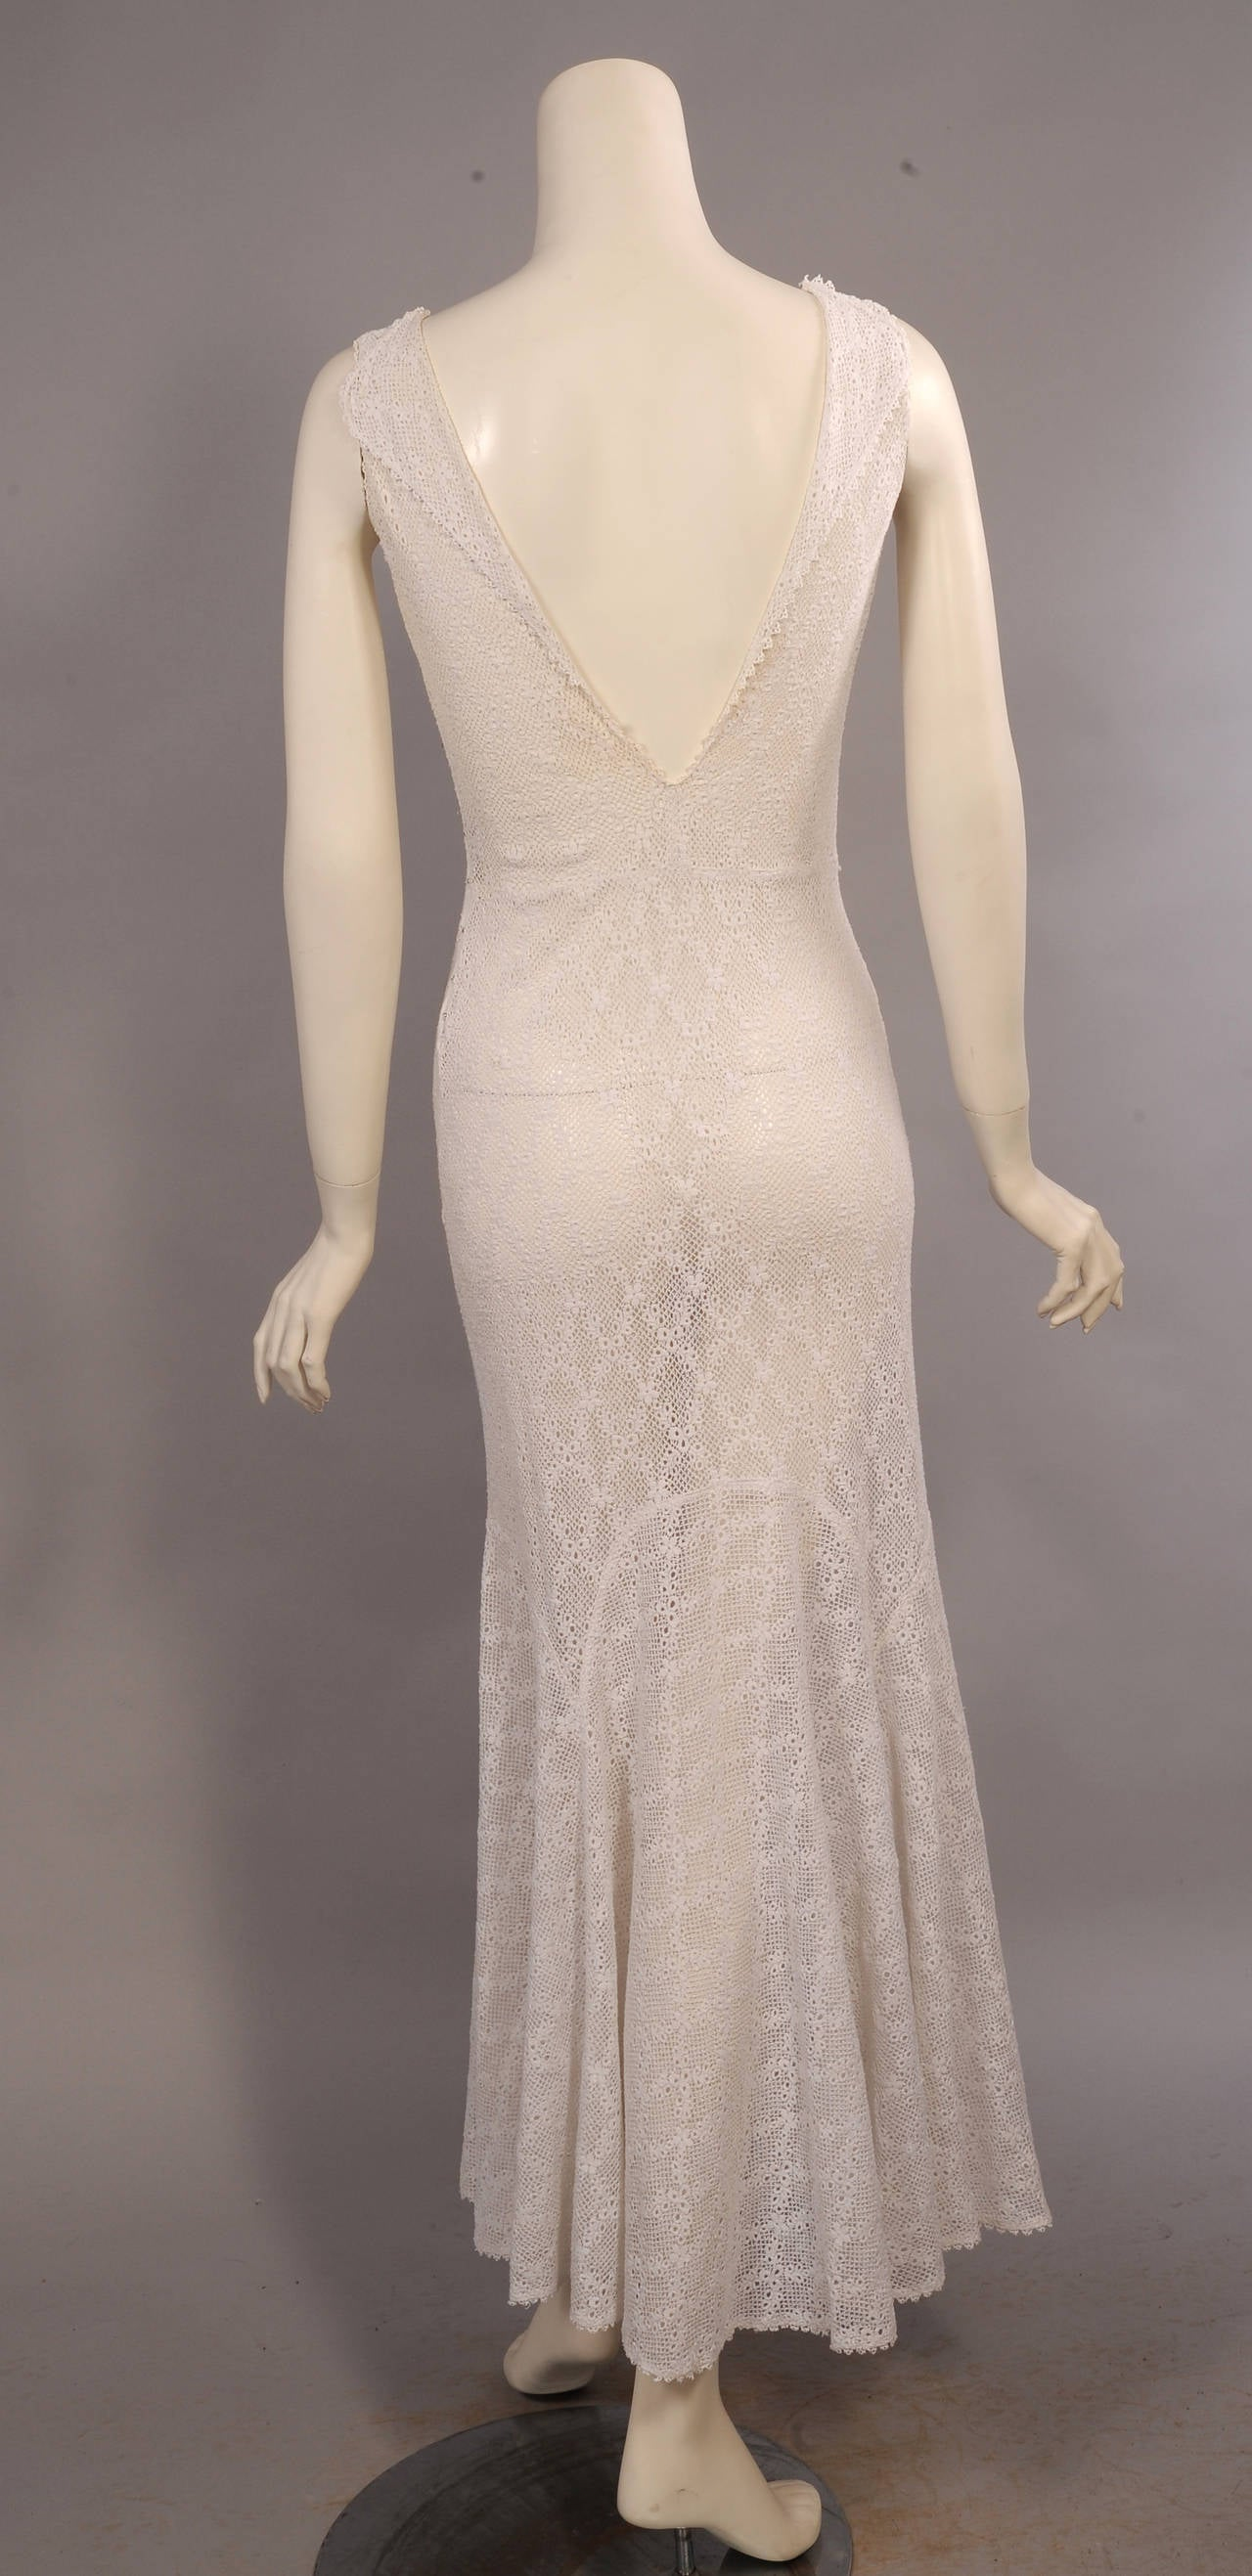 1930 S Bias Cut White Lace Evening Dress At 1stdibs